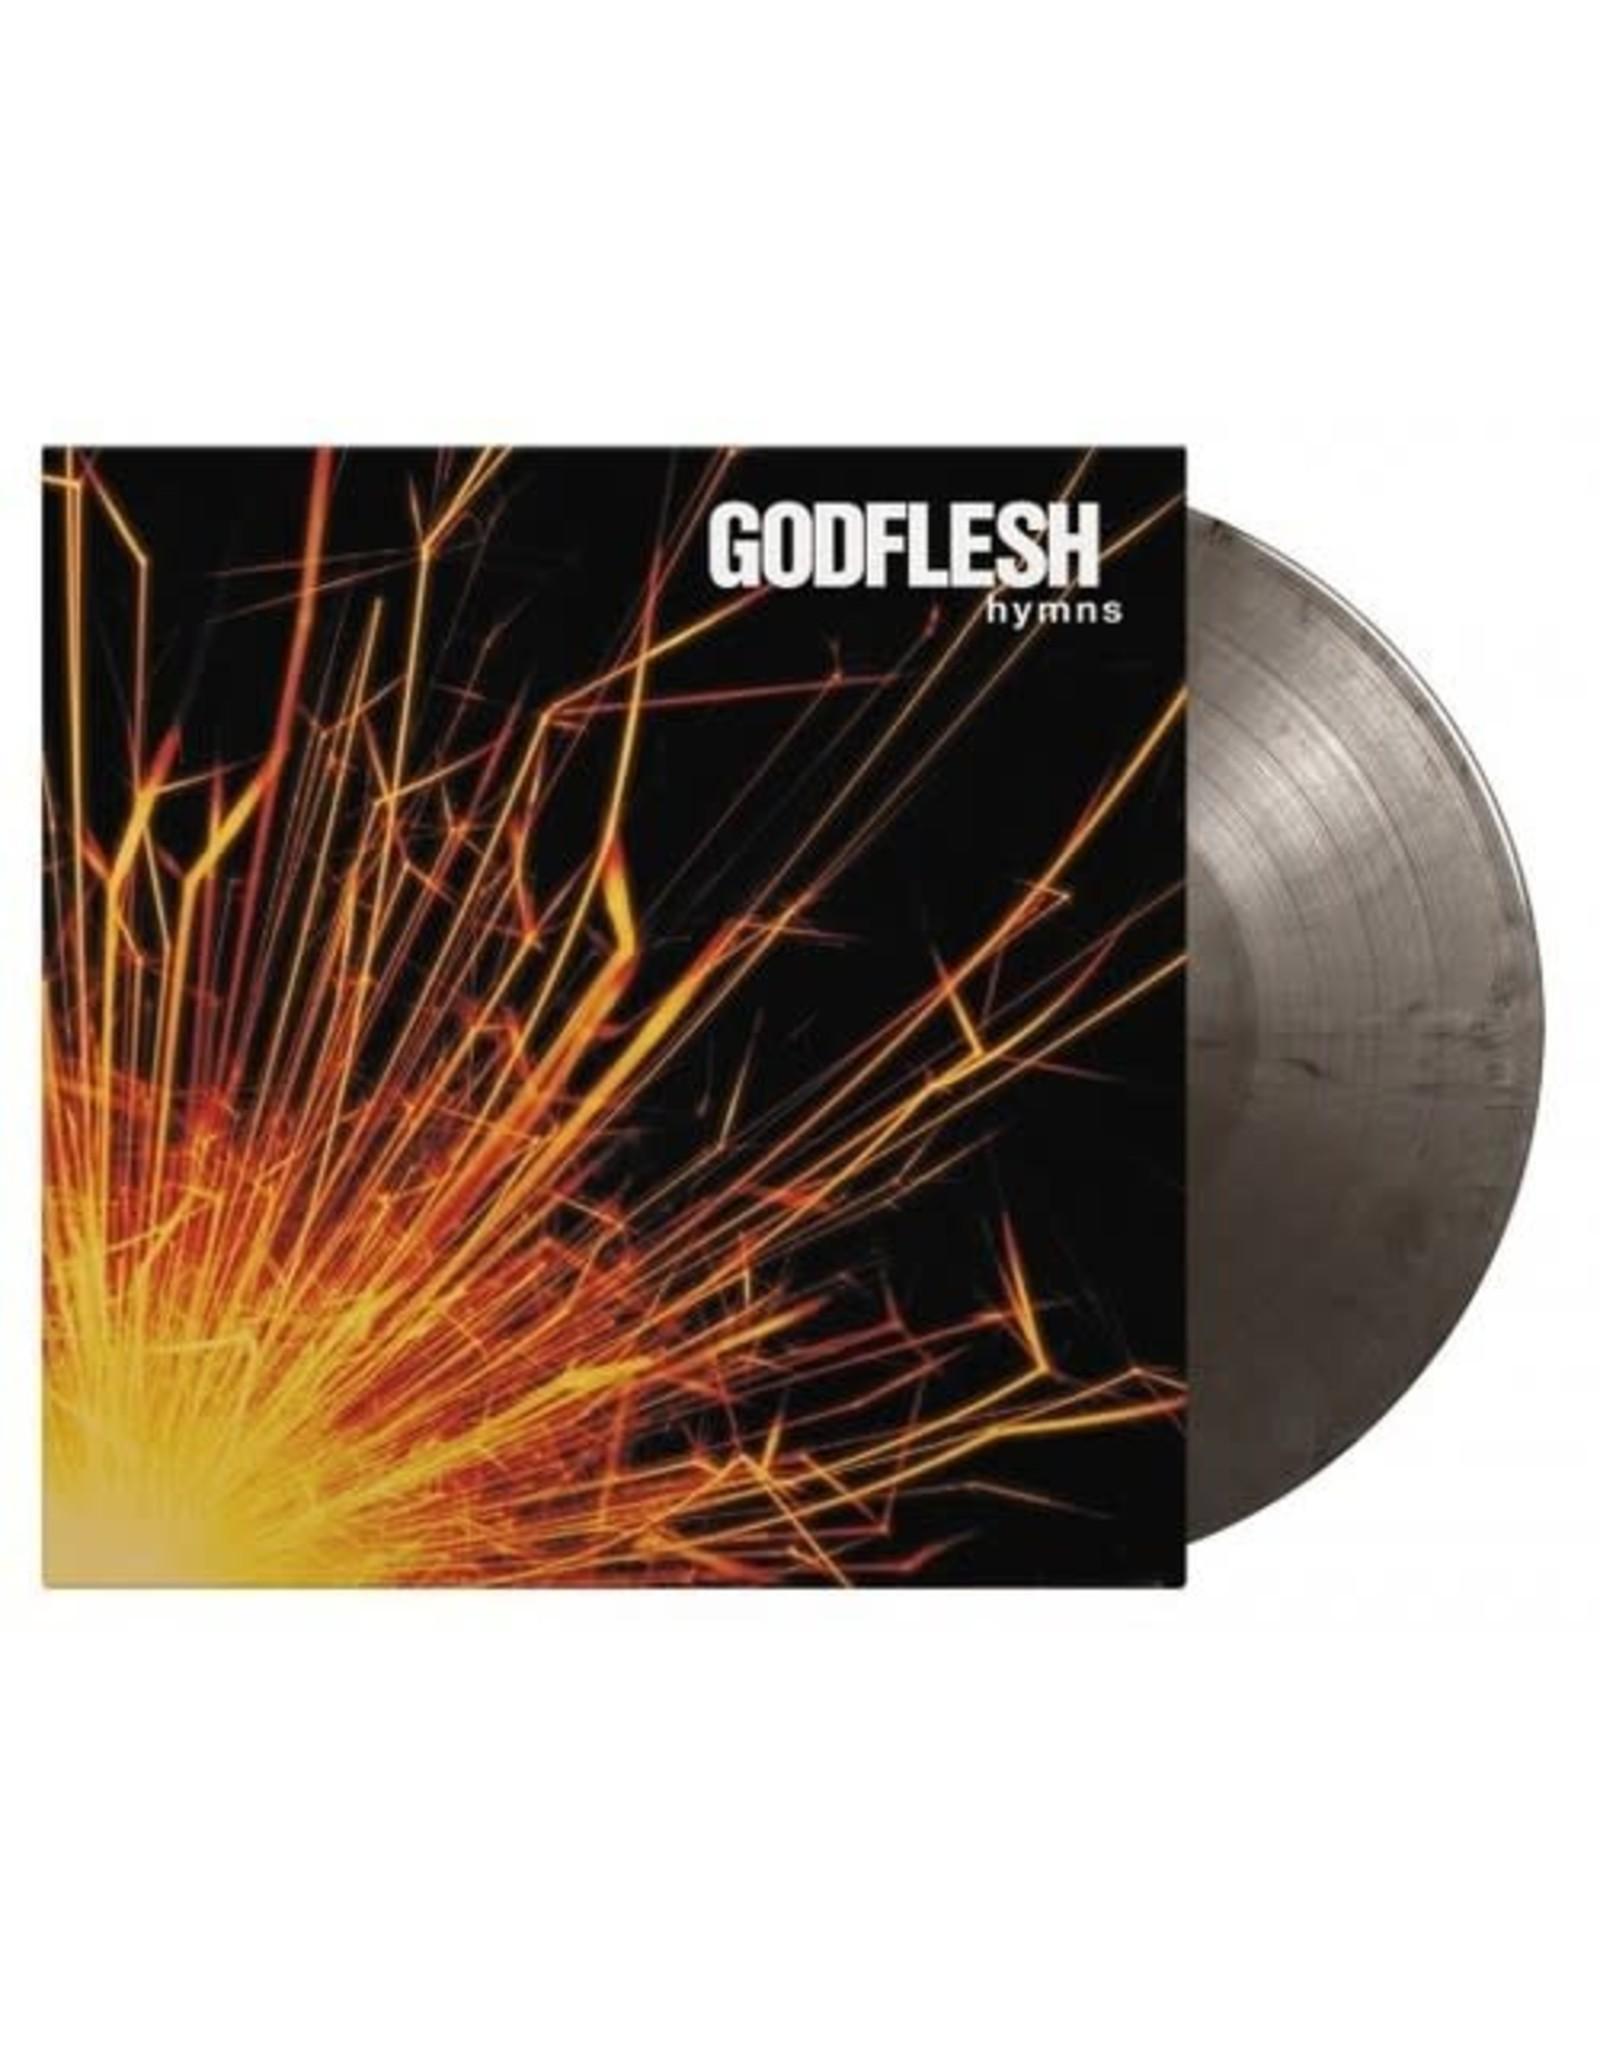 New Vinyl Godflesh - Hymns (EU Import, Colored) 2LP